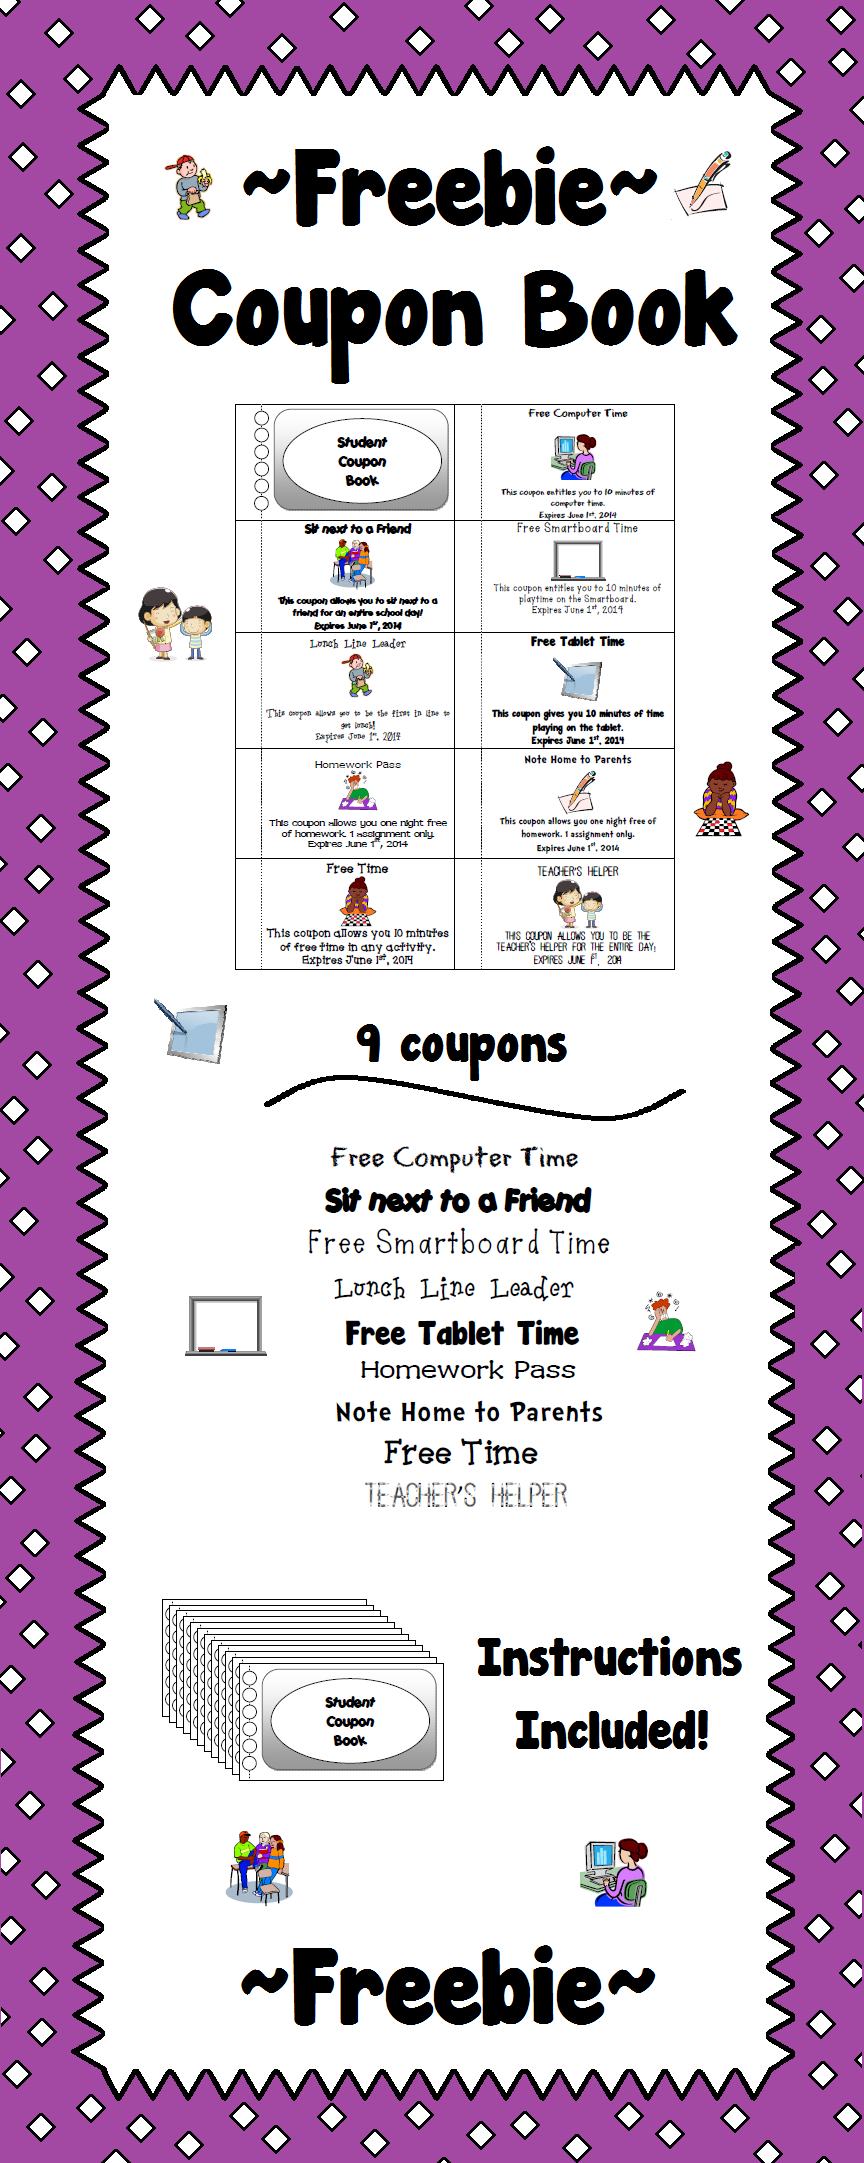 Reward Coupon Book Classroom Newsletter Template Math Constructed Response Coupon Book